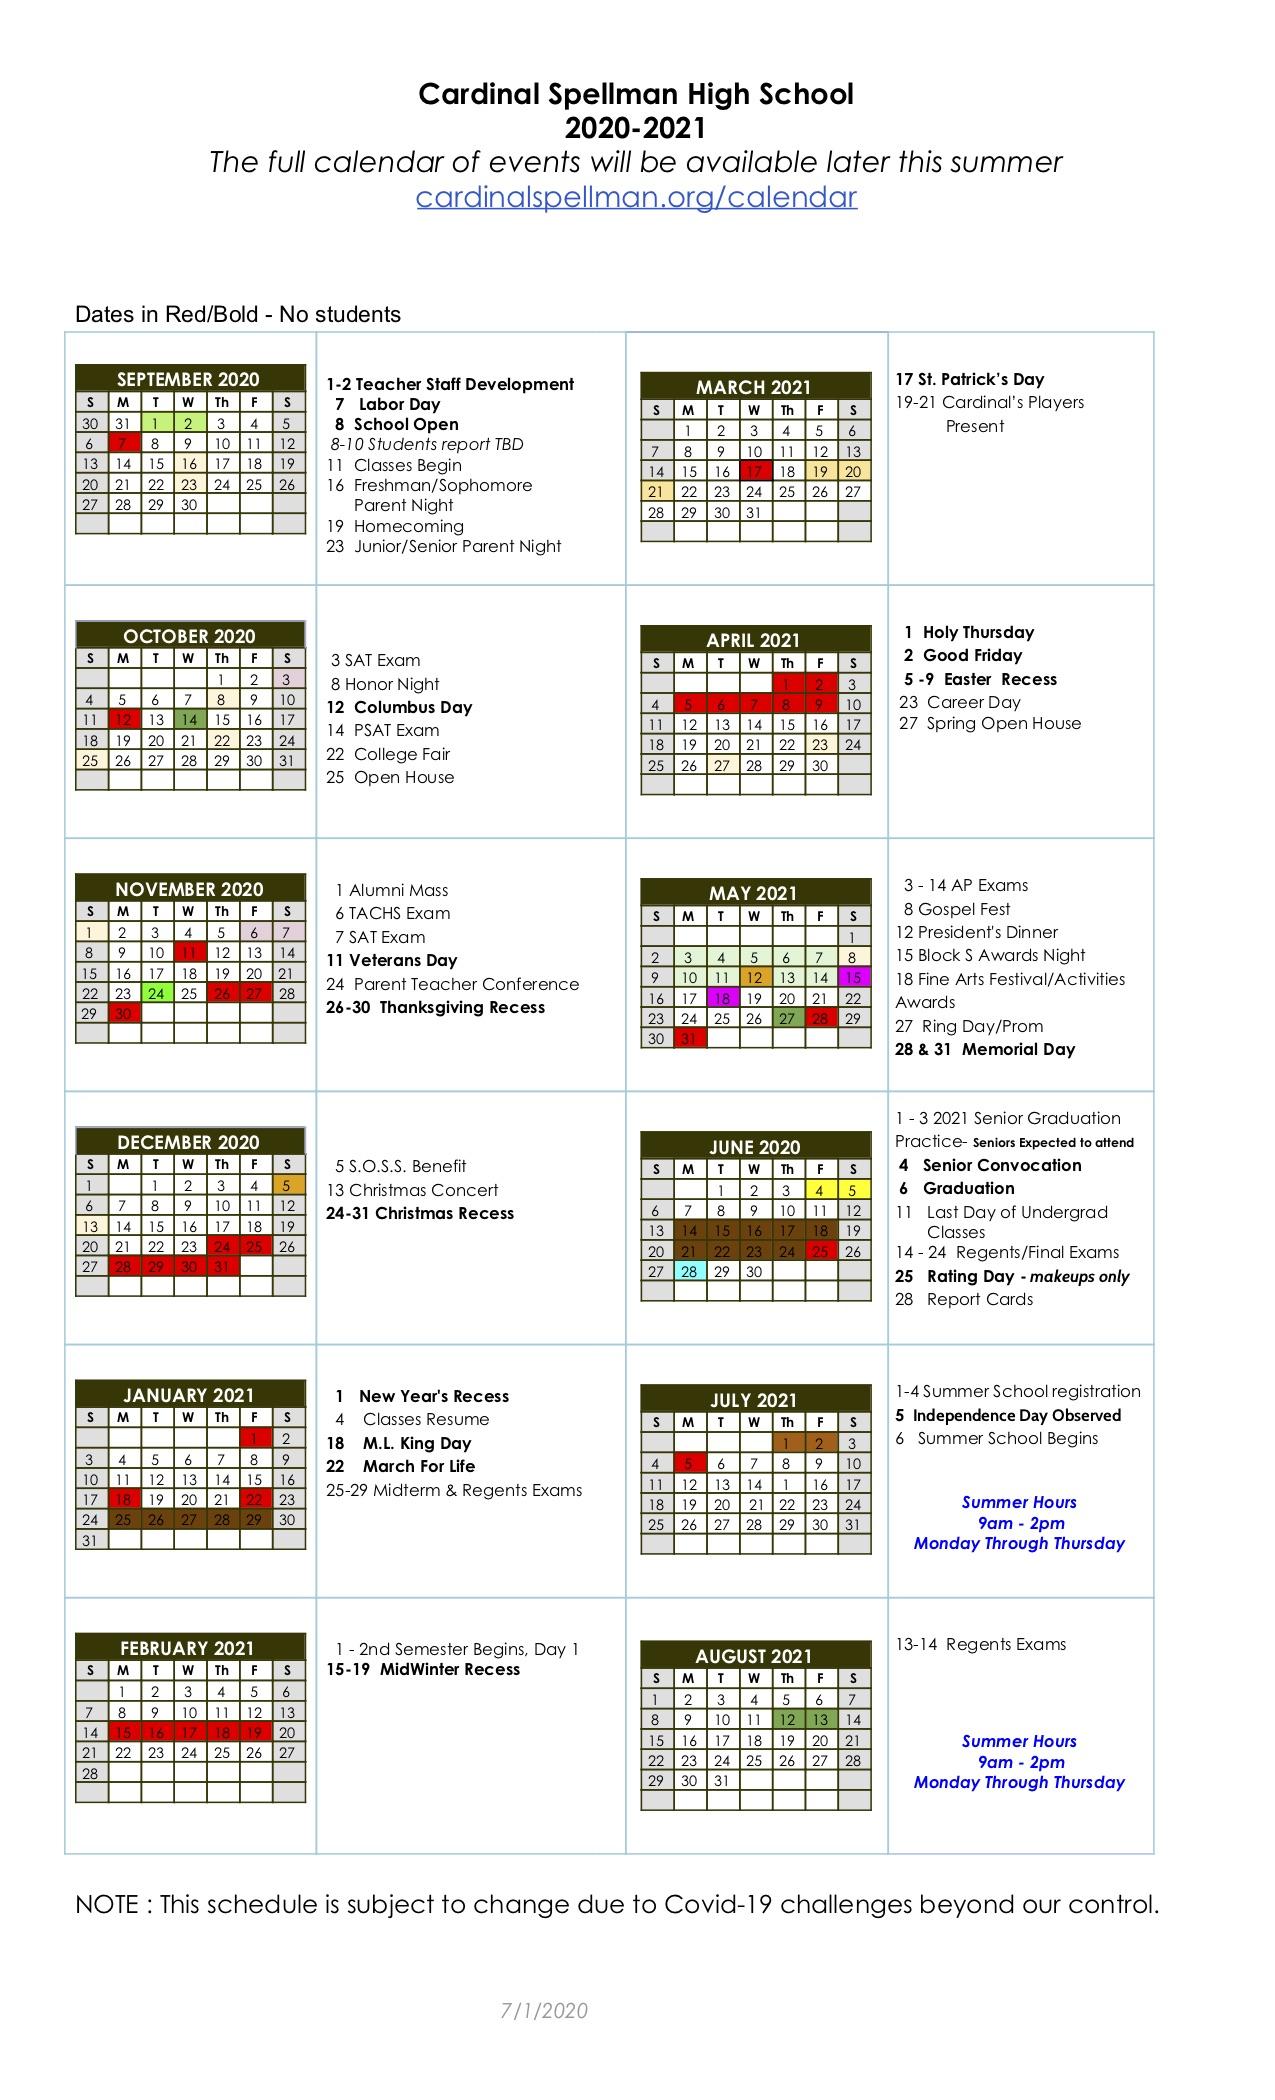 University Of New Haven Academic Calendar 2021 | 2021 Calendar pertaining to Academic Calendar 2021-2020 University Of Central Florida